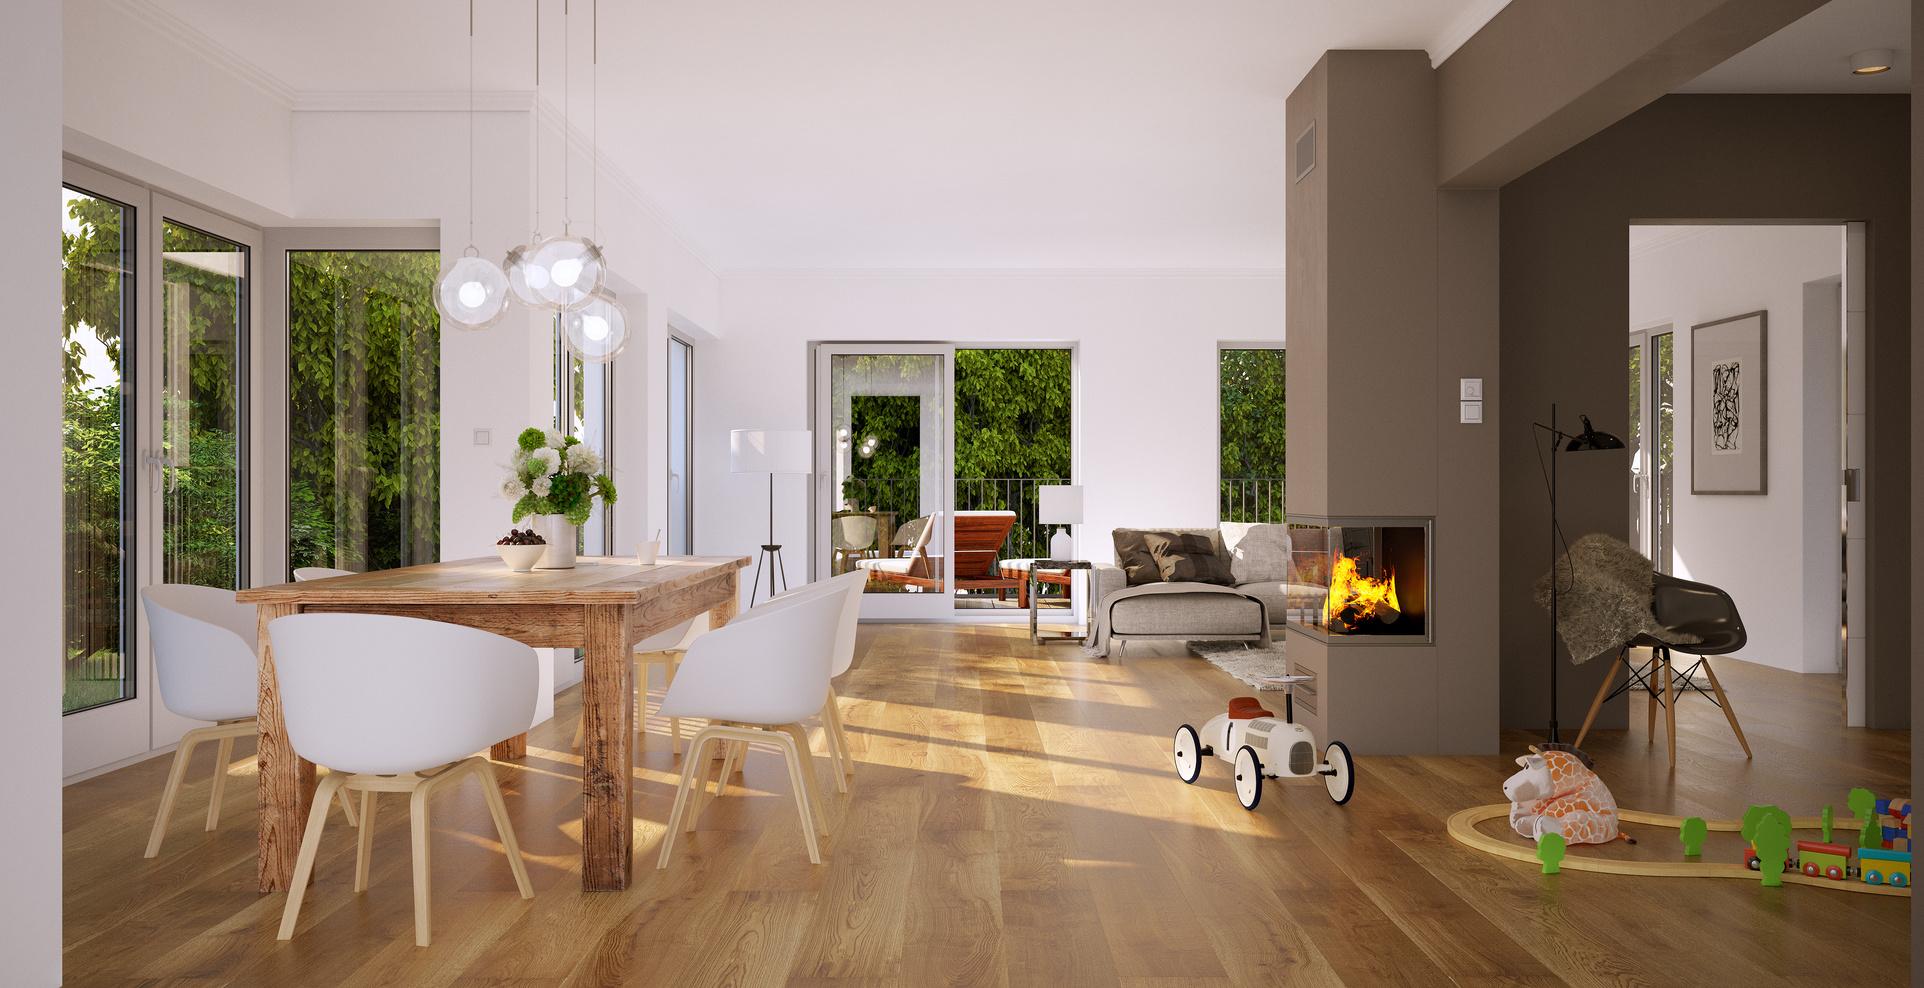 living room in luxury family home - Wohnzimmer in Luxus Einfamilienhaus